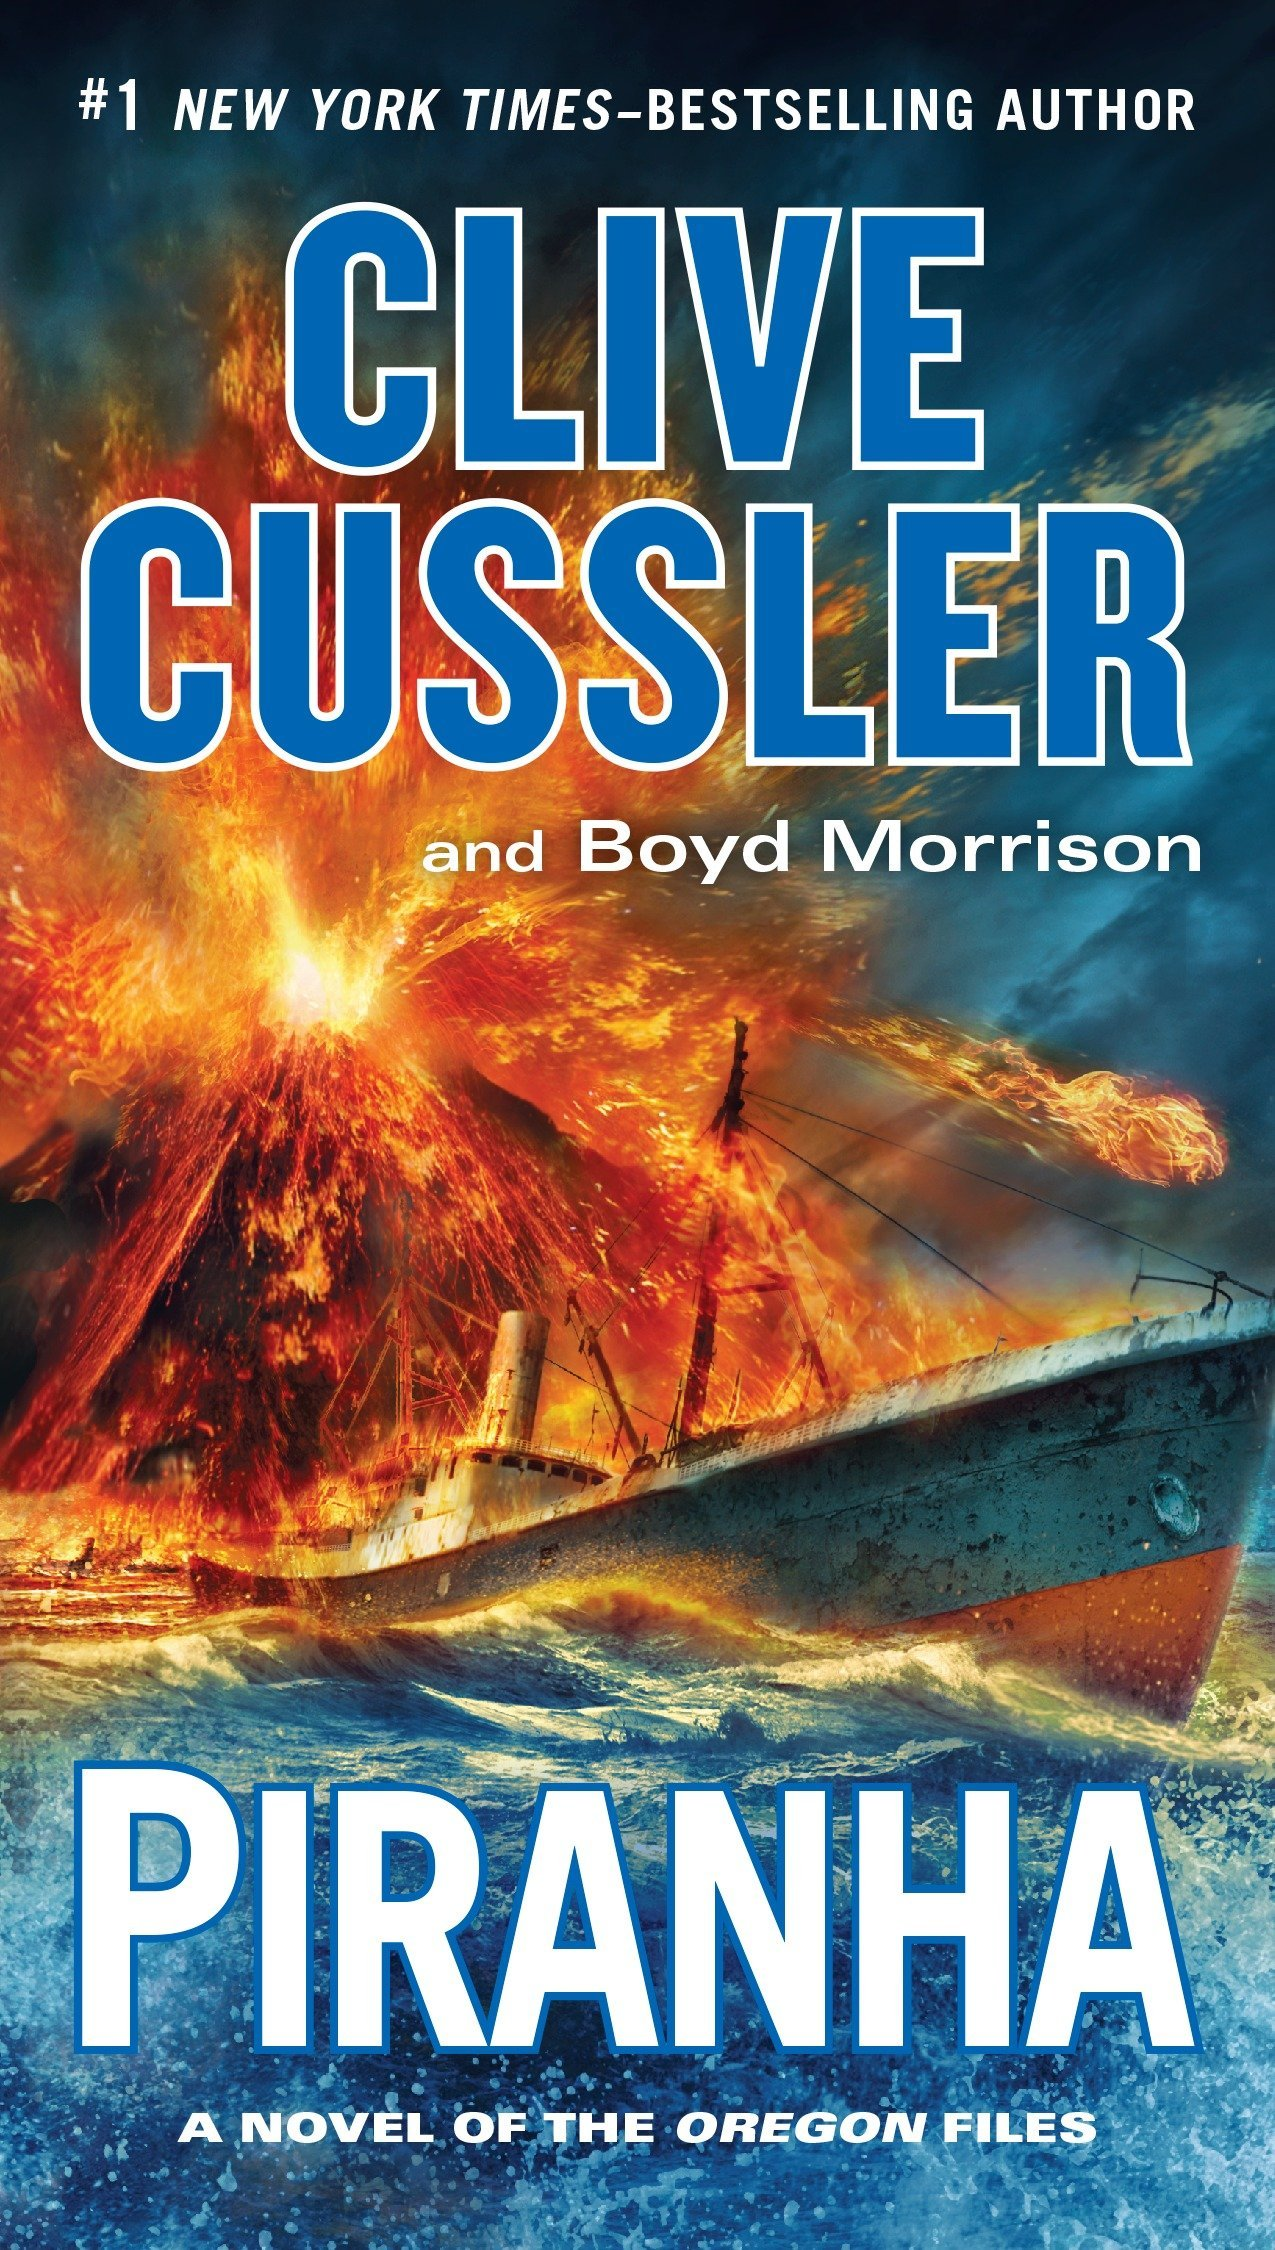 Amazon.com: Piranha (The Oregon Files) (9780425280188): Clive Cussler, Boyd  Morrison: Books